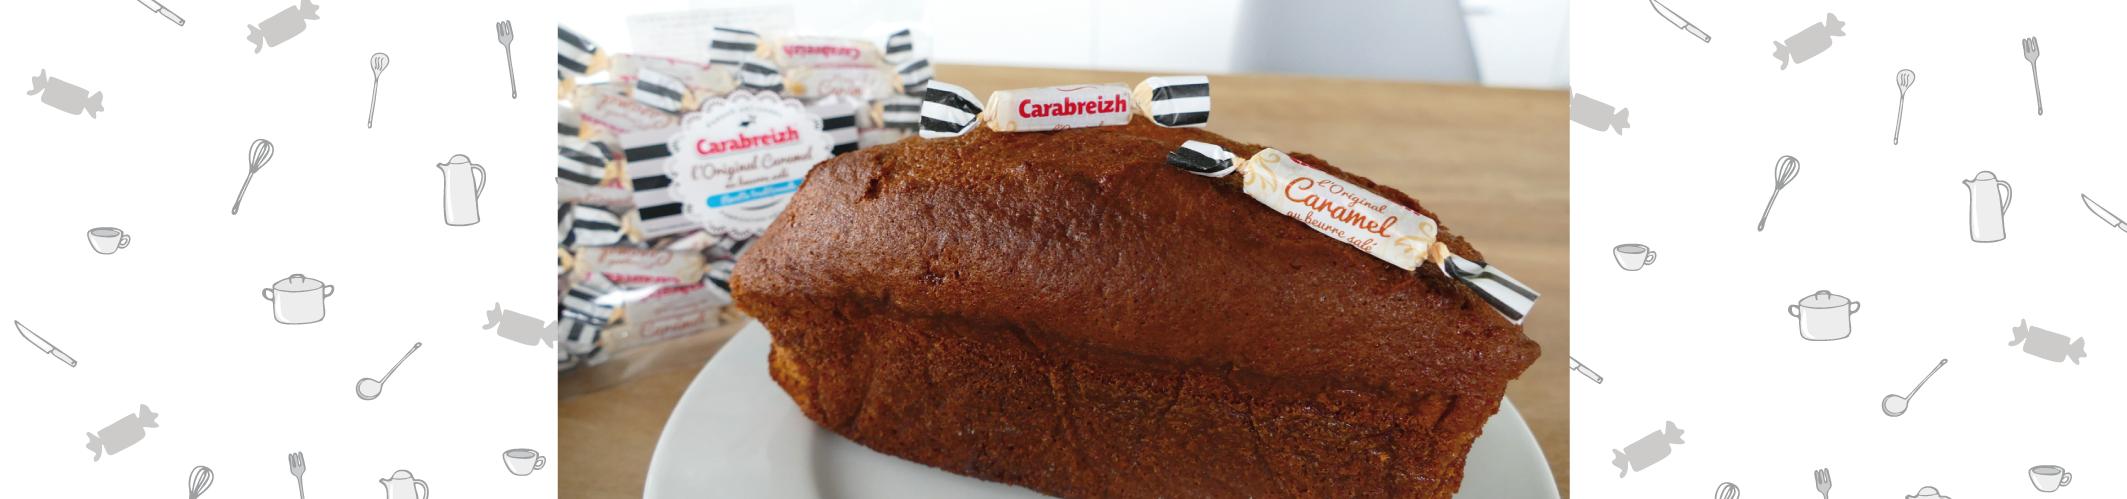 Cake au caramel beurre salé en barre Carabreizh !